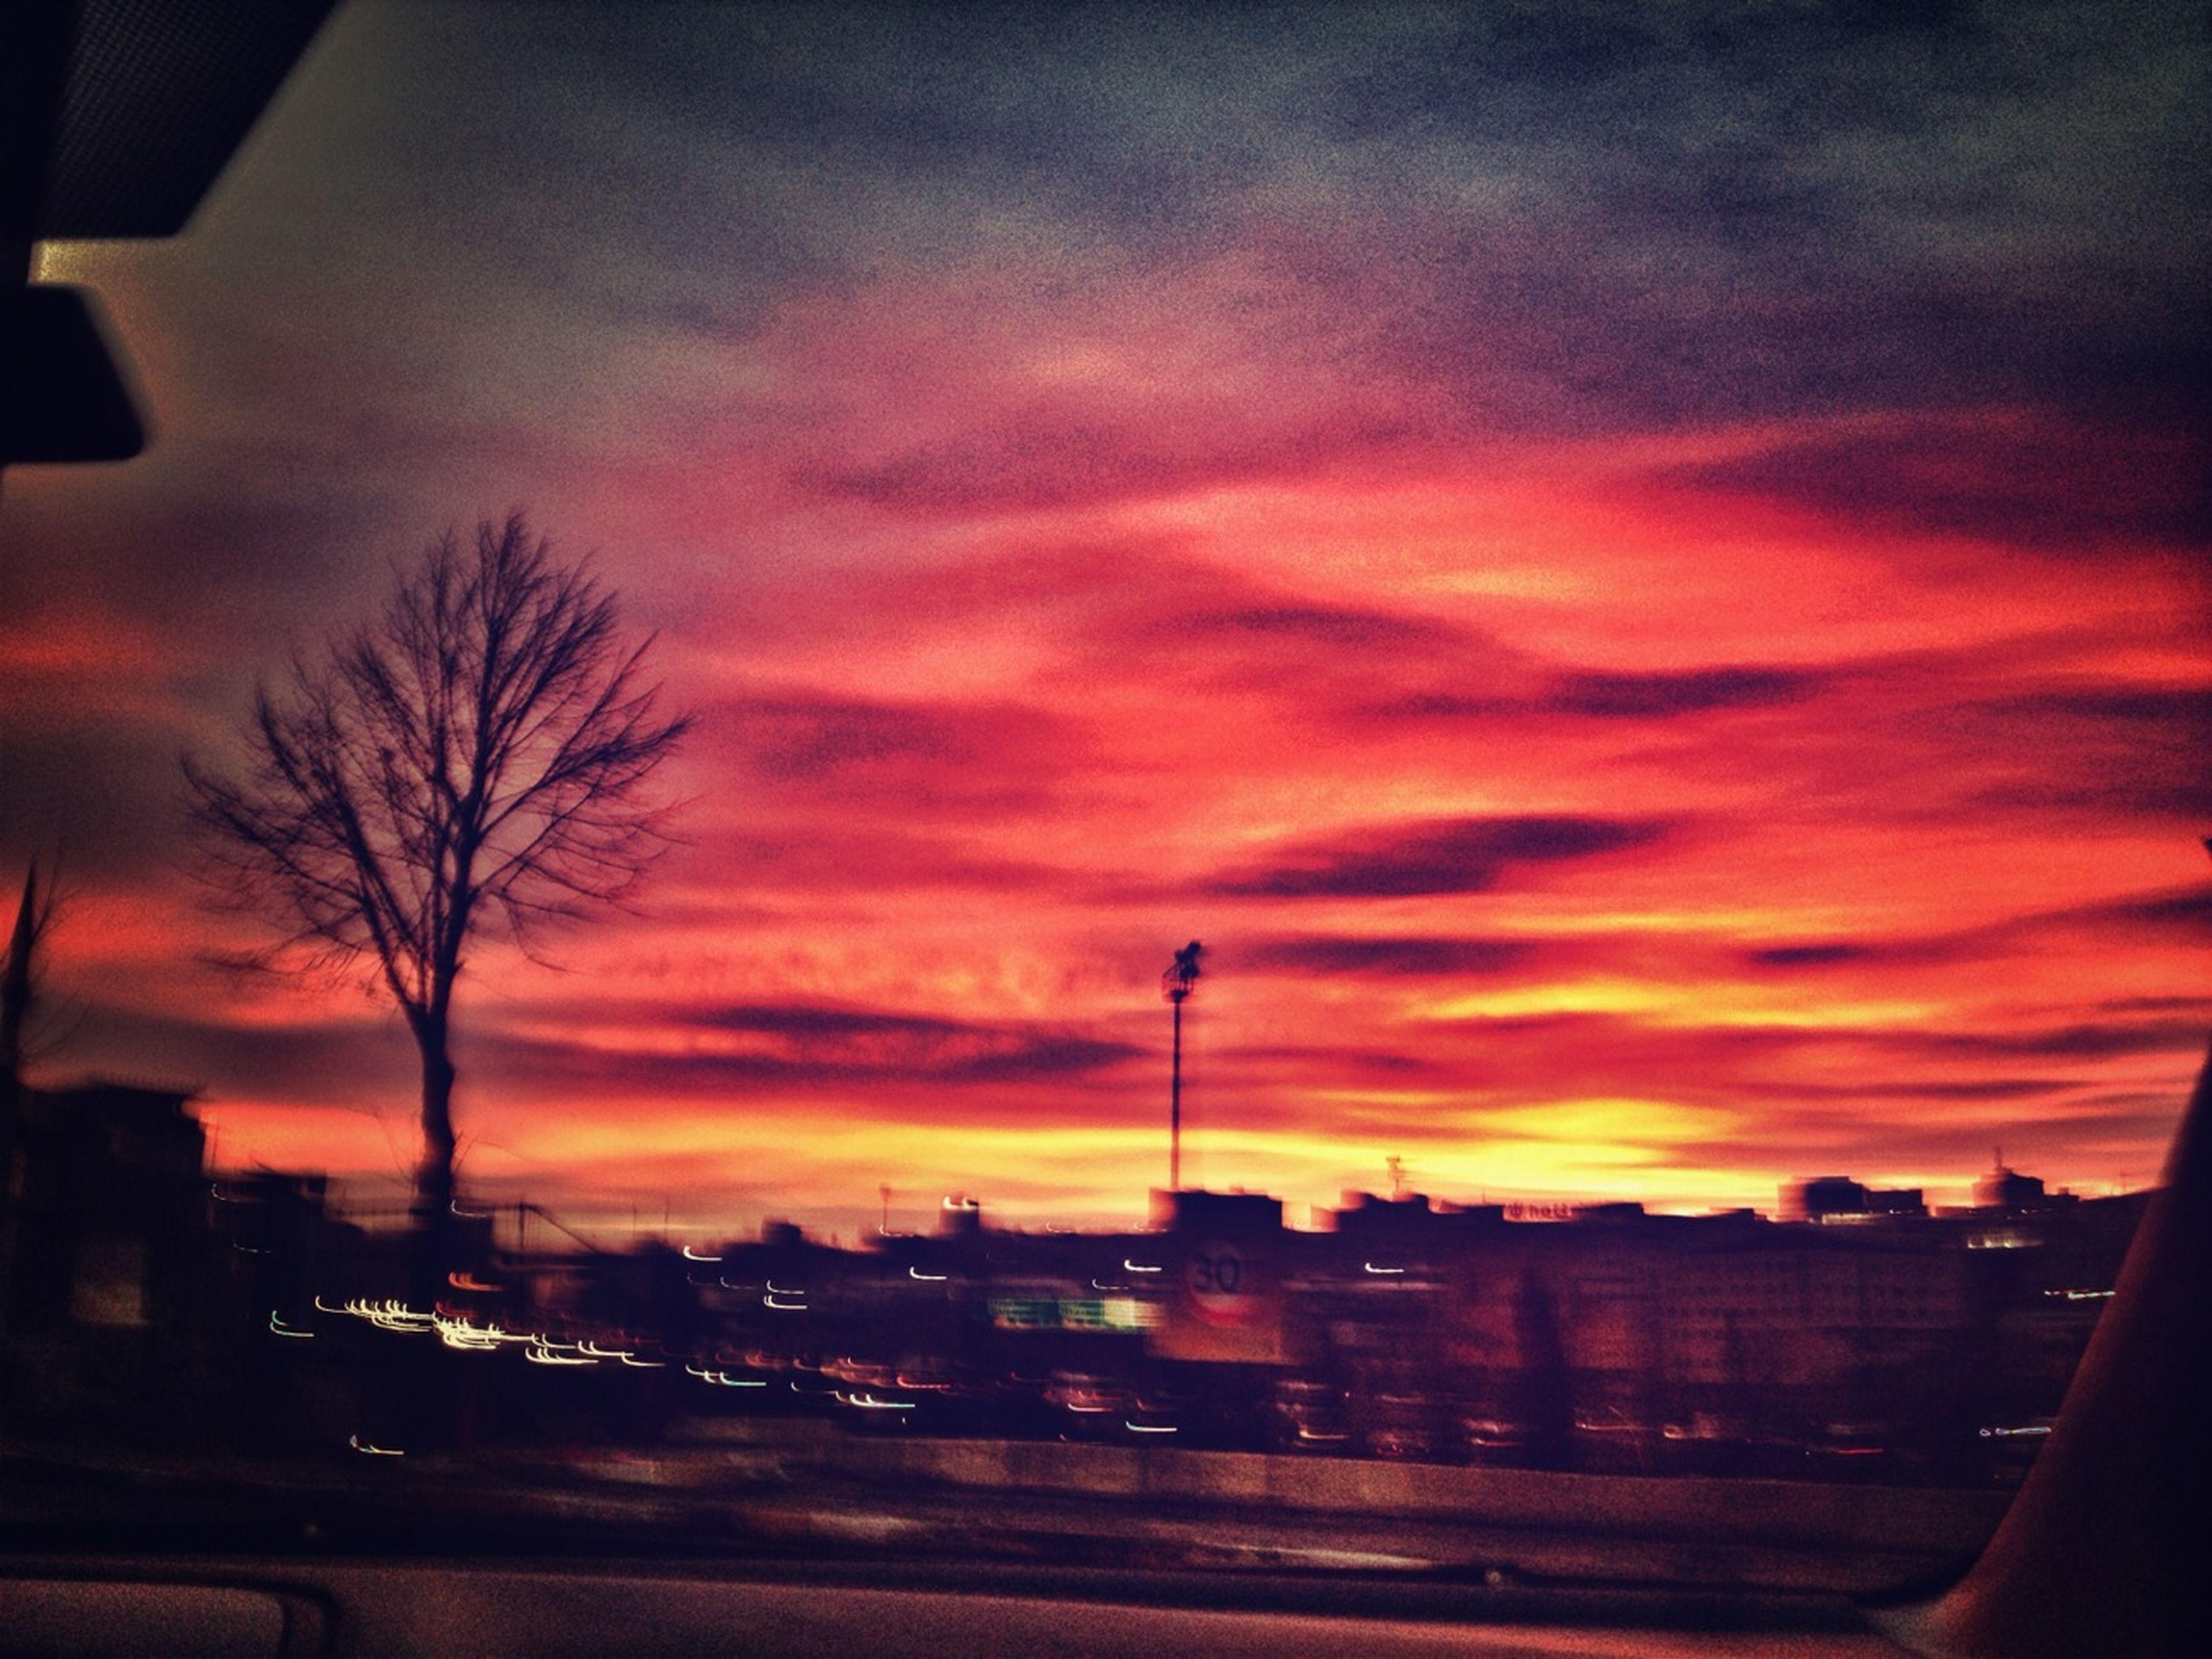 sunset, sky, transportation, silhouette, cloud - sky, road, orange color, car, tree, land vehicle, street, street light, city, bare tree, cloudy, mode of transport, building exterior, dramatic sky, dusk, cloud